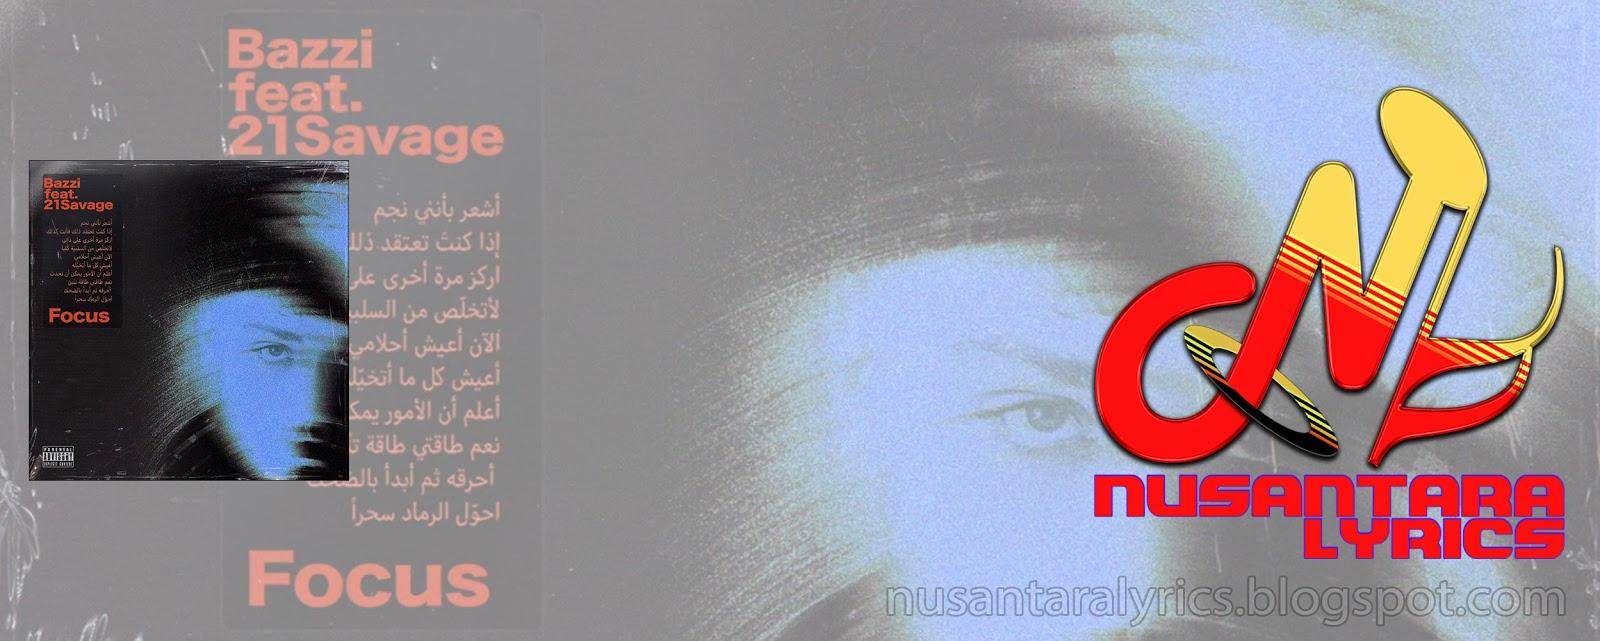 Bazzi feat 21 Savage - Focus - Nusantara Lyrics